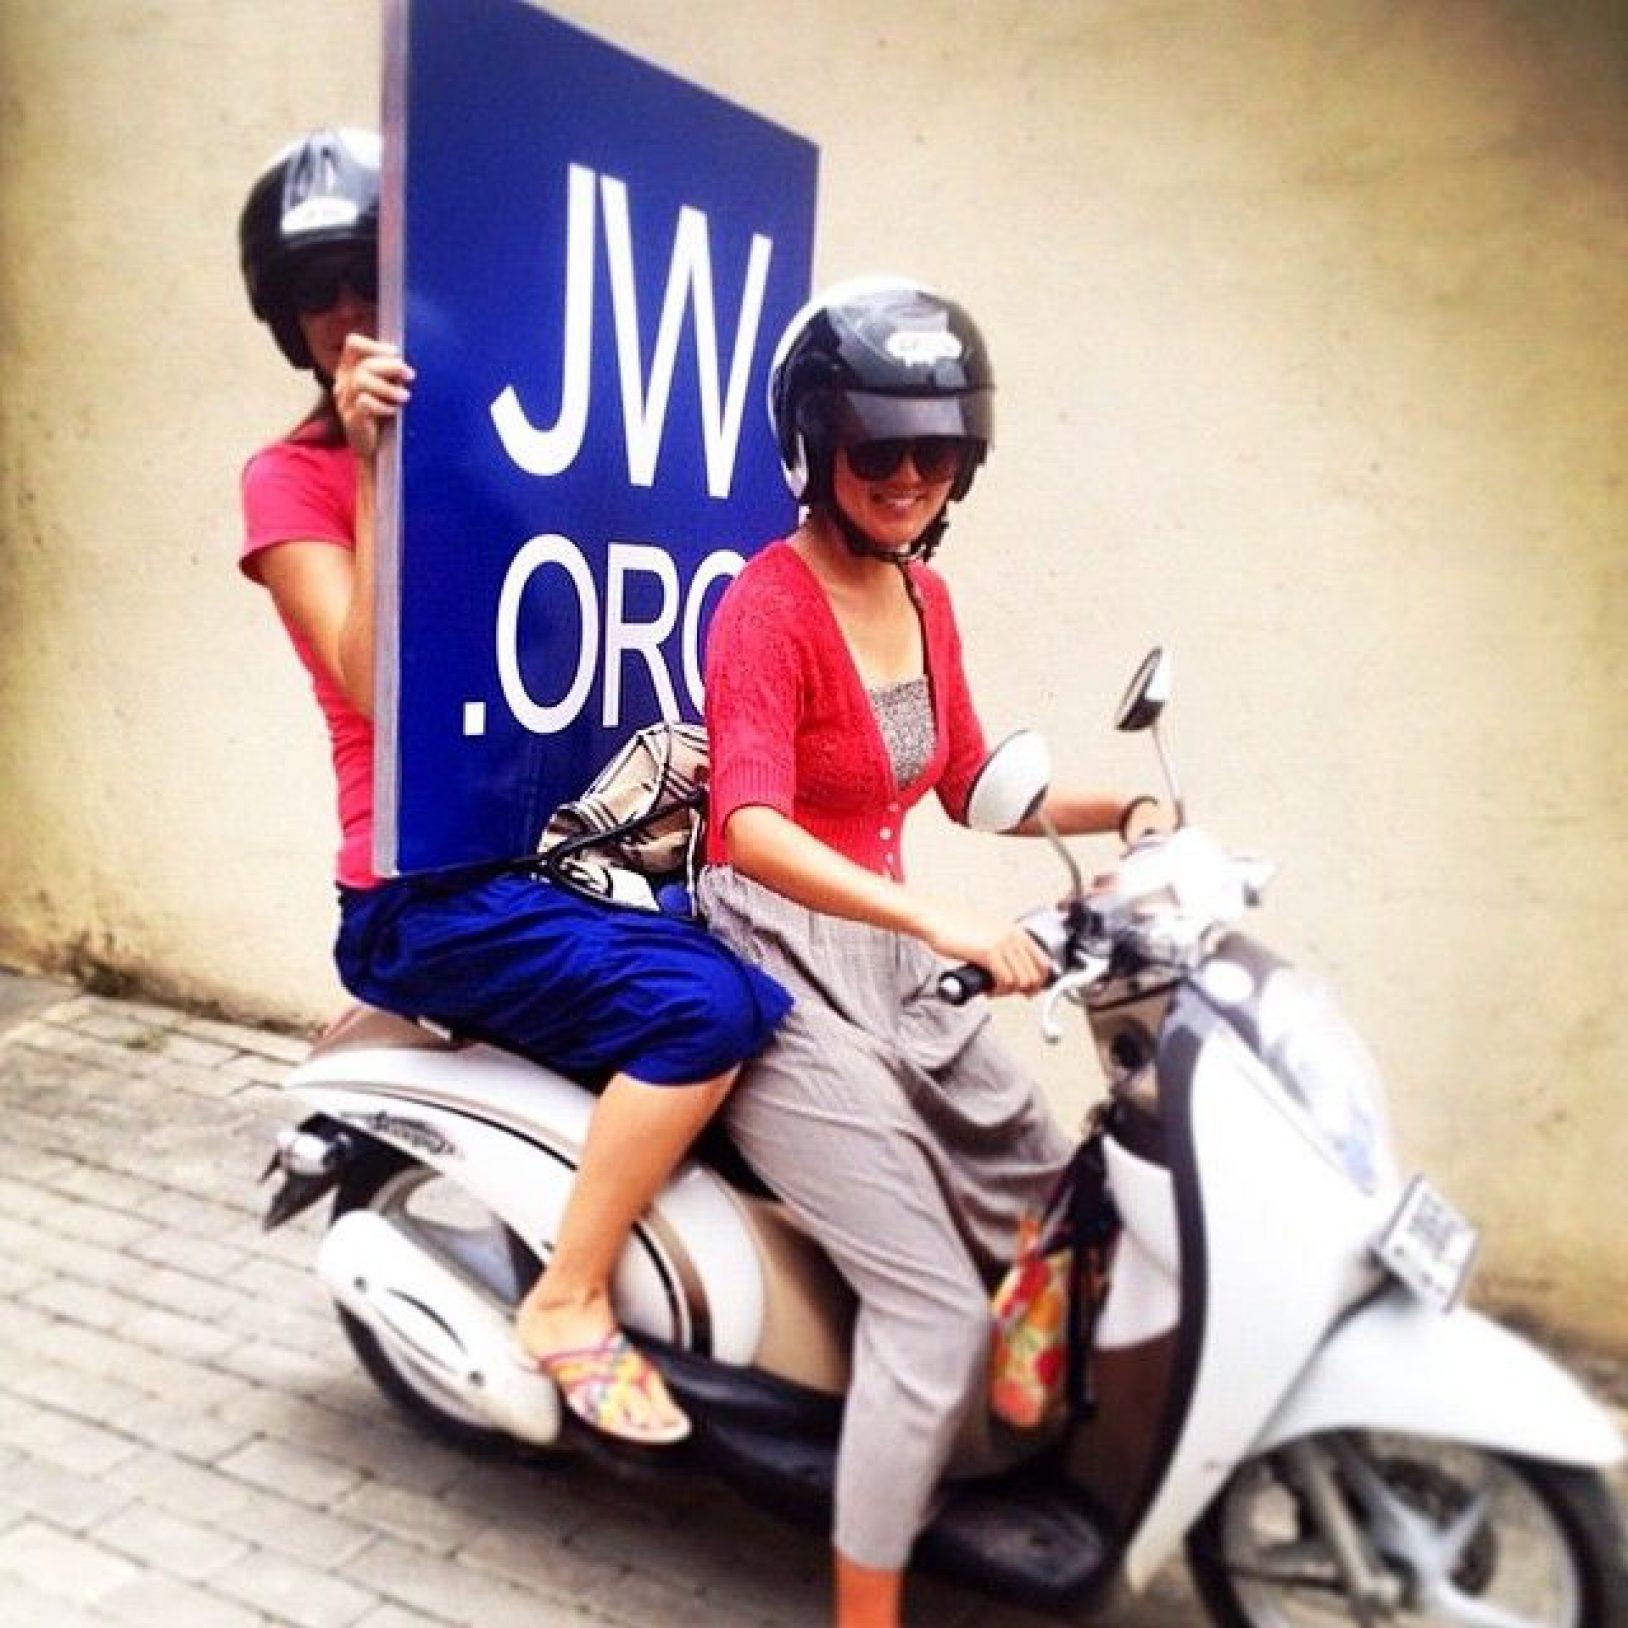 jw_motor.jpg